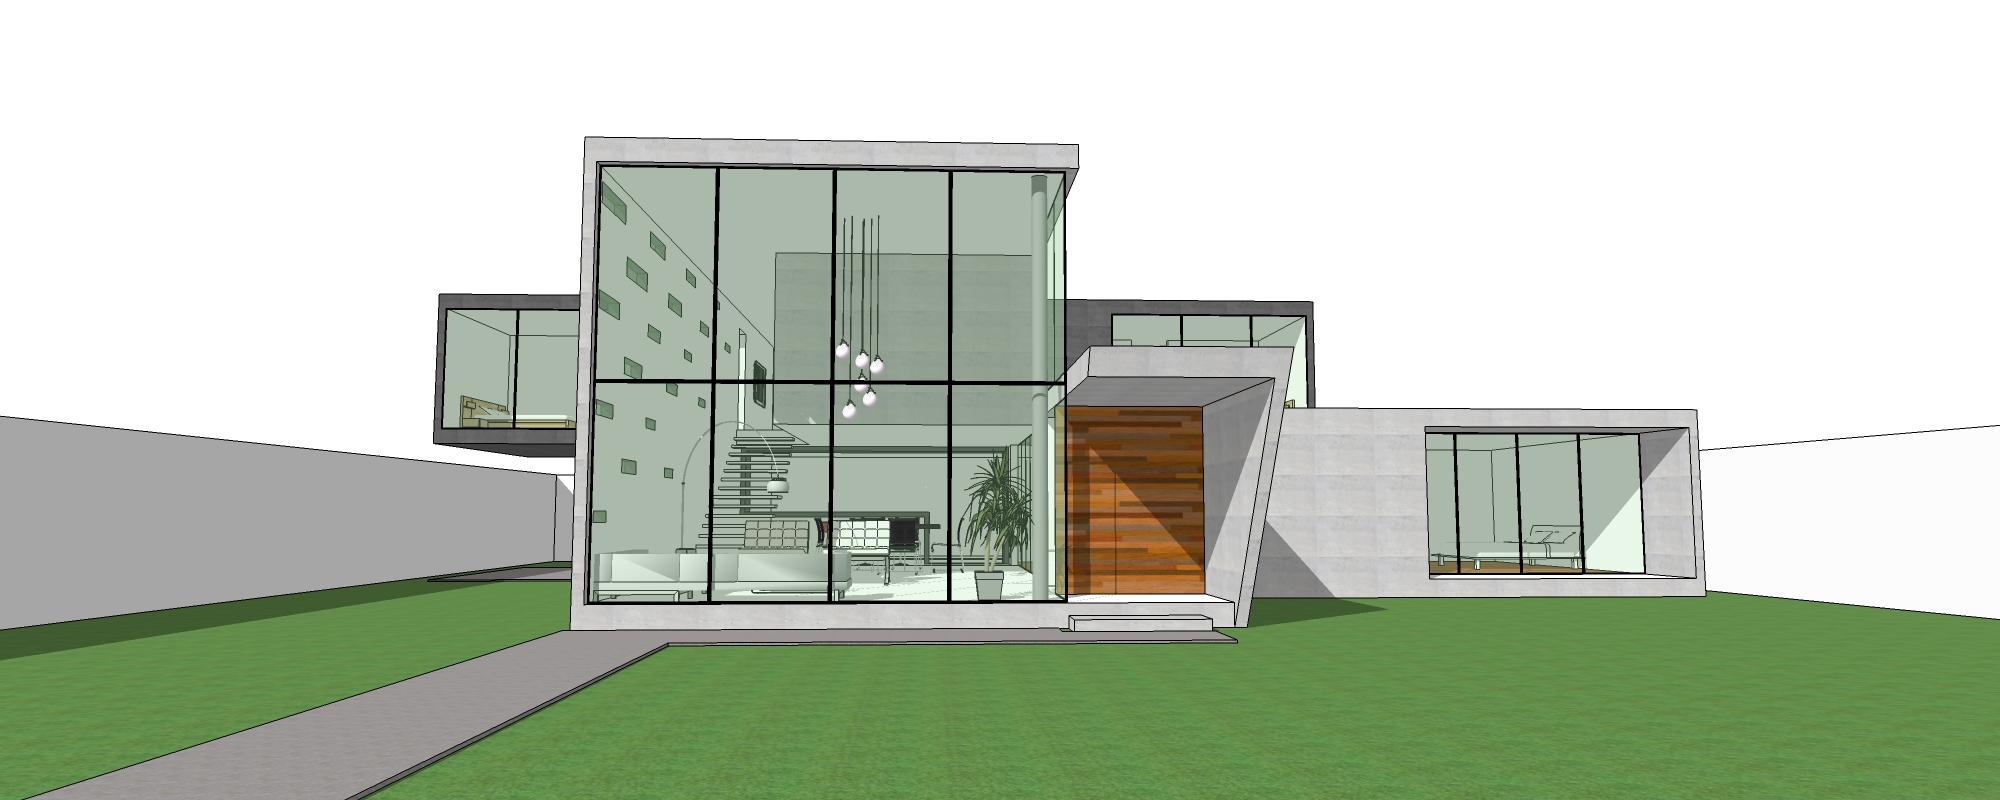 CJ-house / MEGA arquitectura